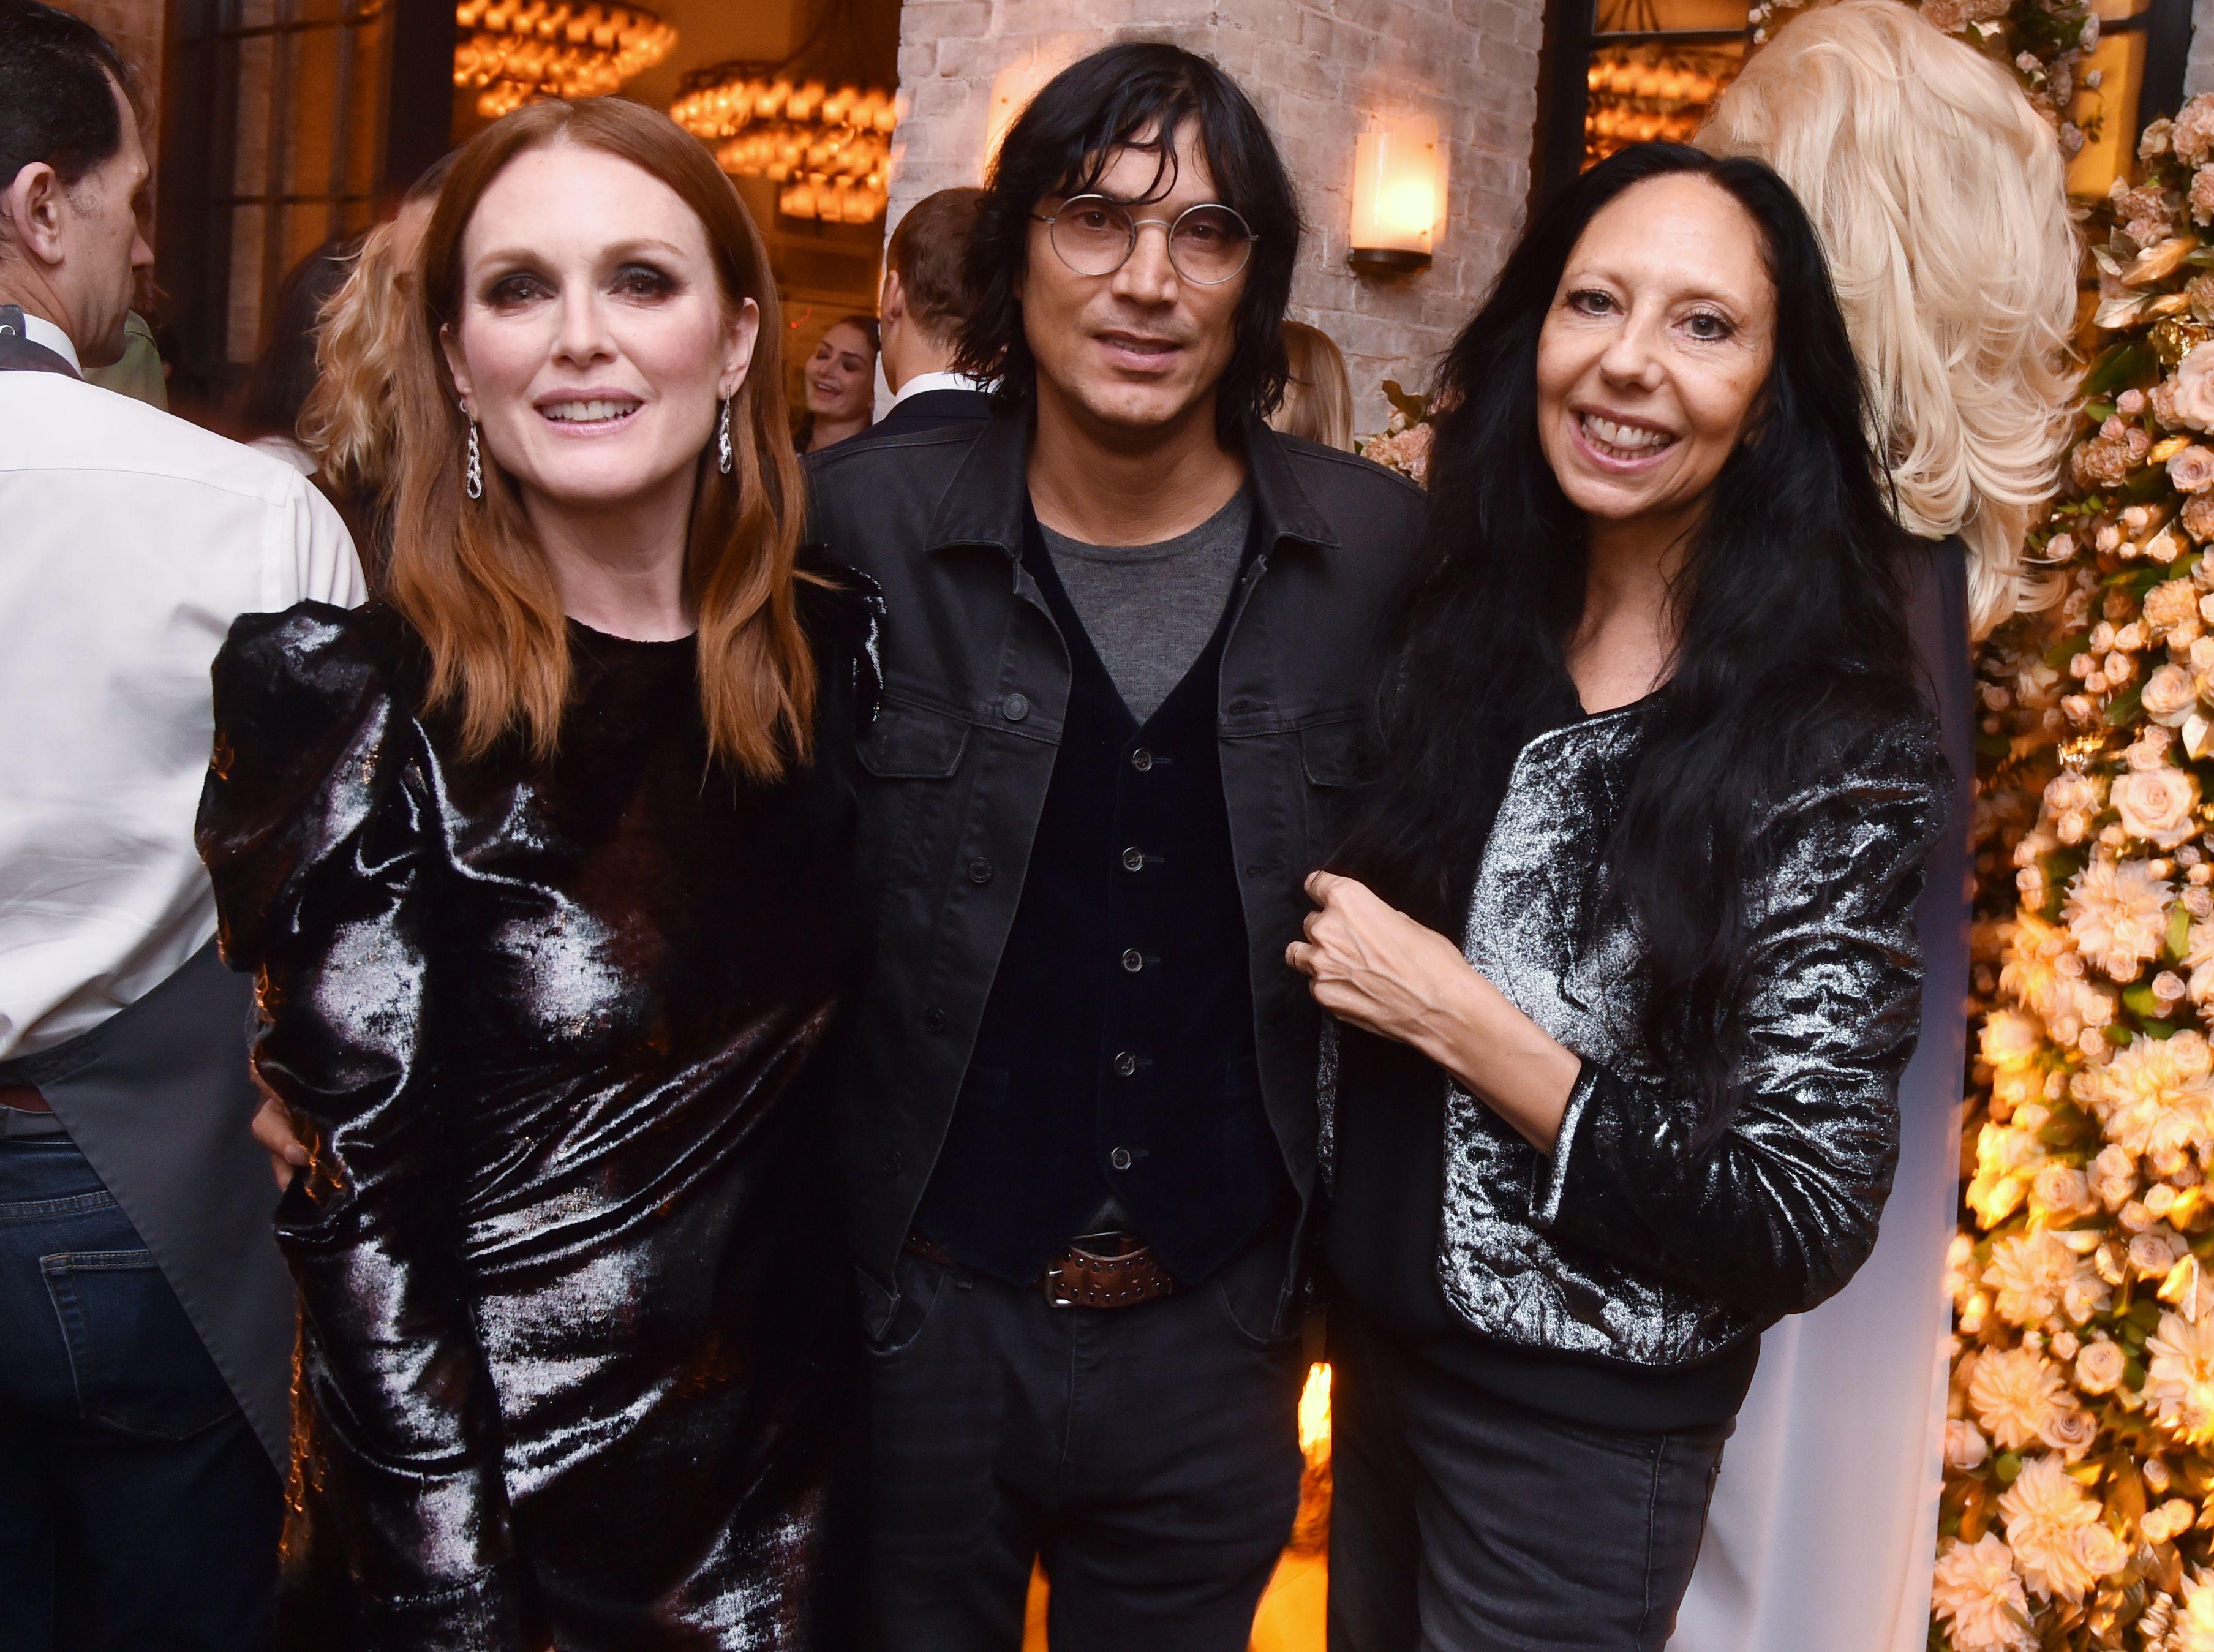 Julianne Moore, Vinoodh Matador and Inez van Lamsweerde